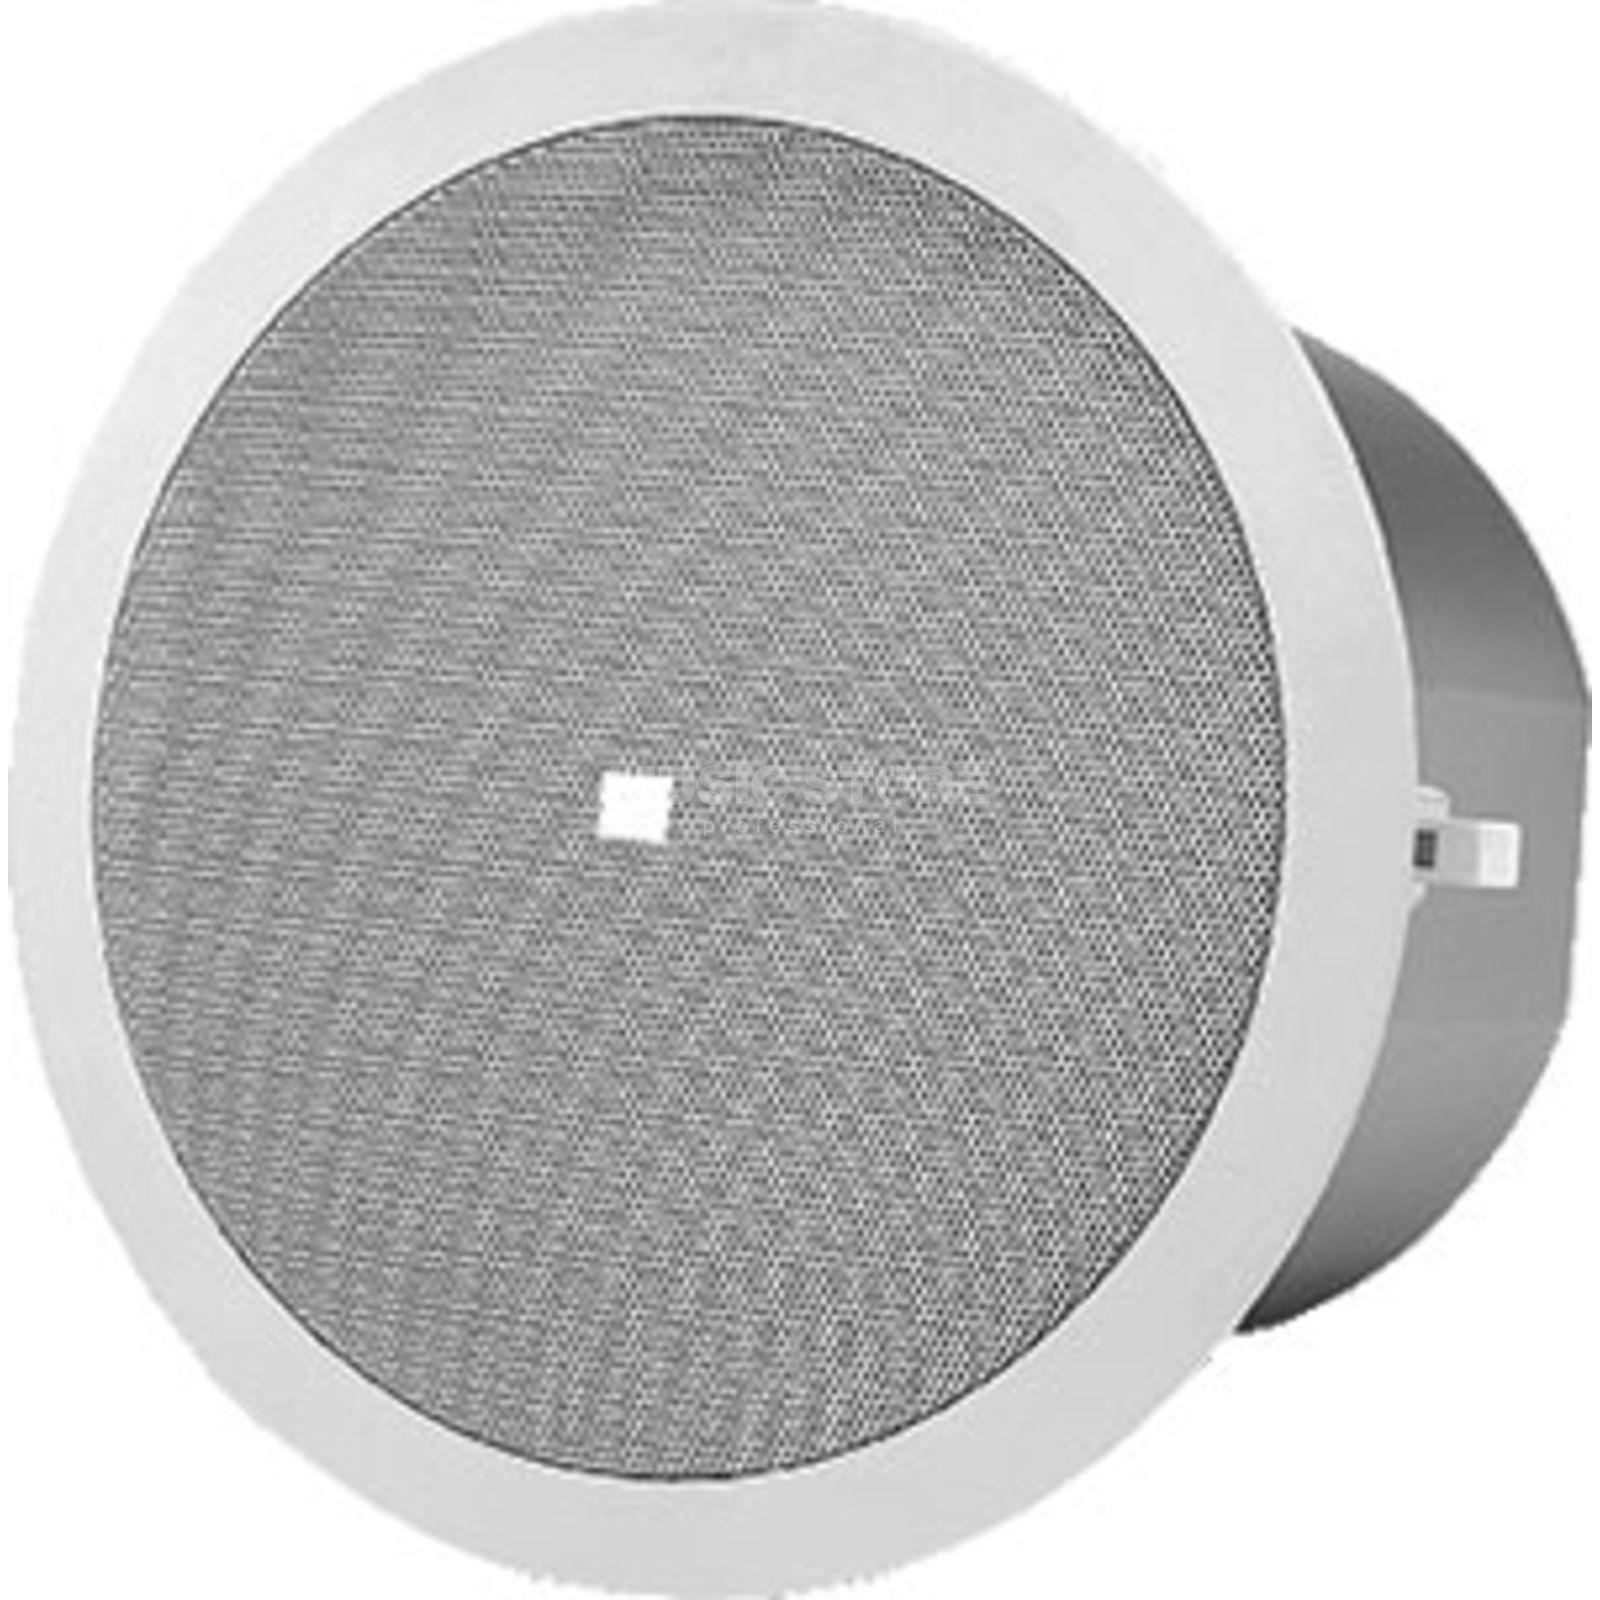 speakers product pair control inch jbl speaker compact micro ceiling